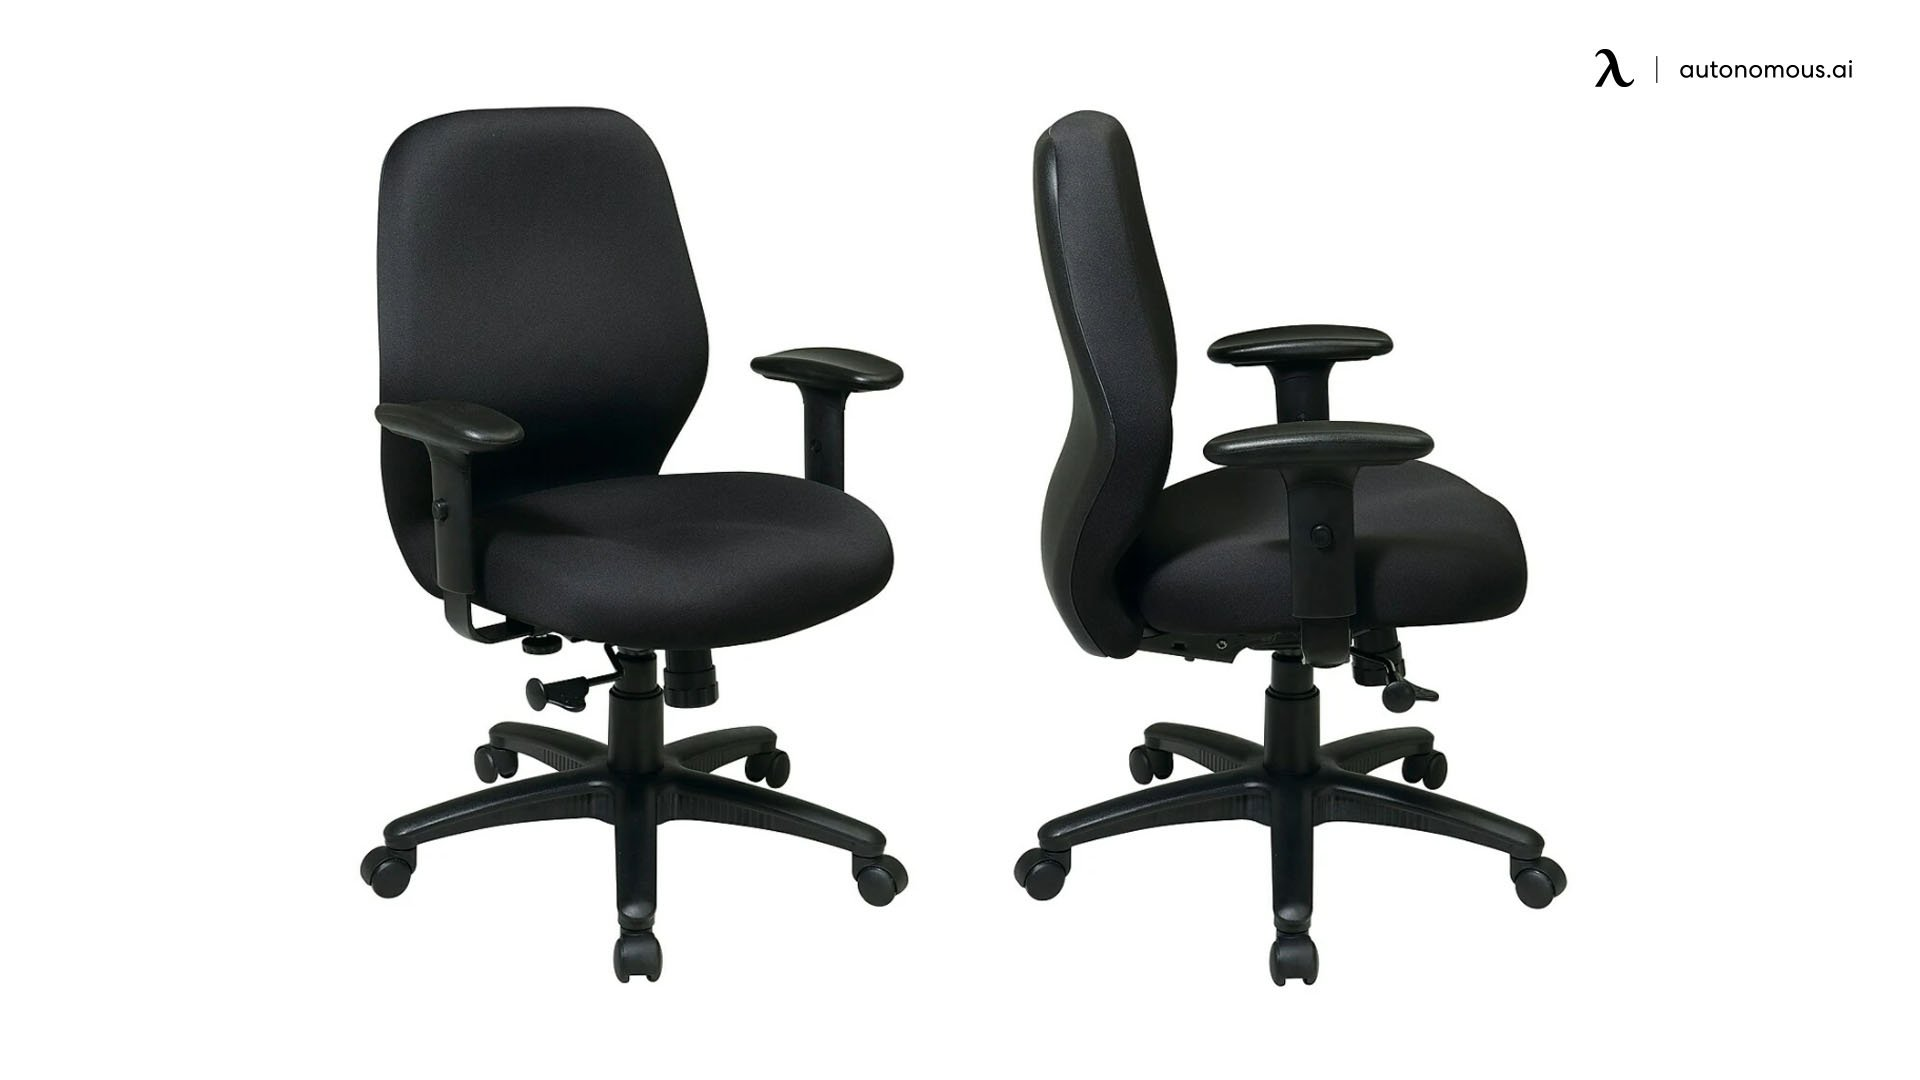 WorkSmart Ergonomic Chair